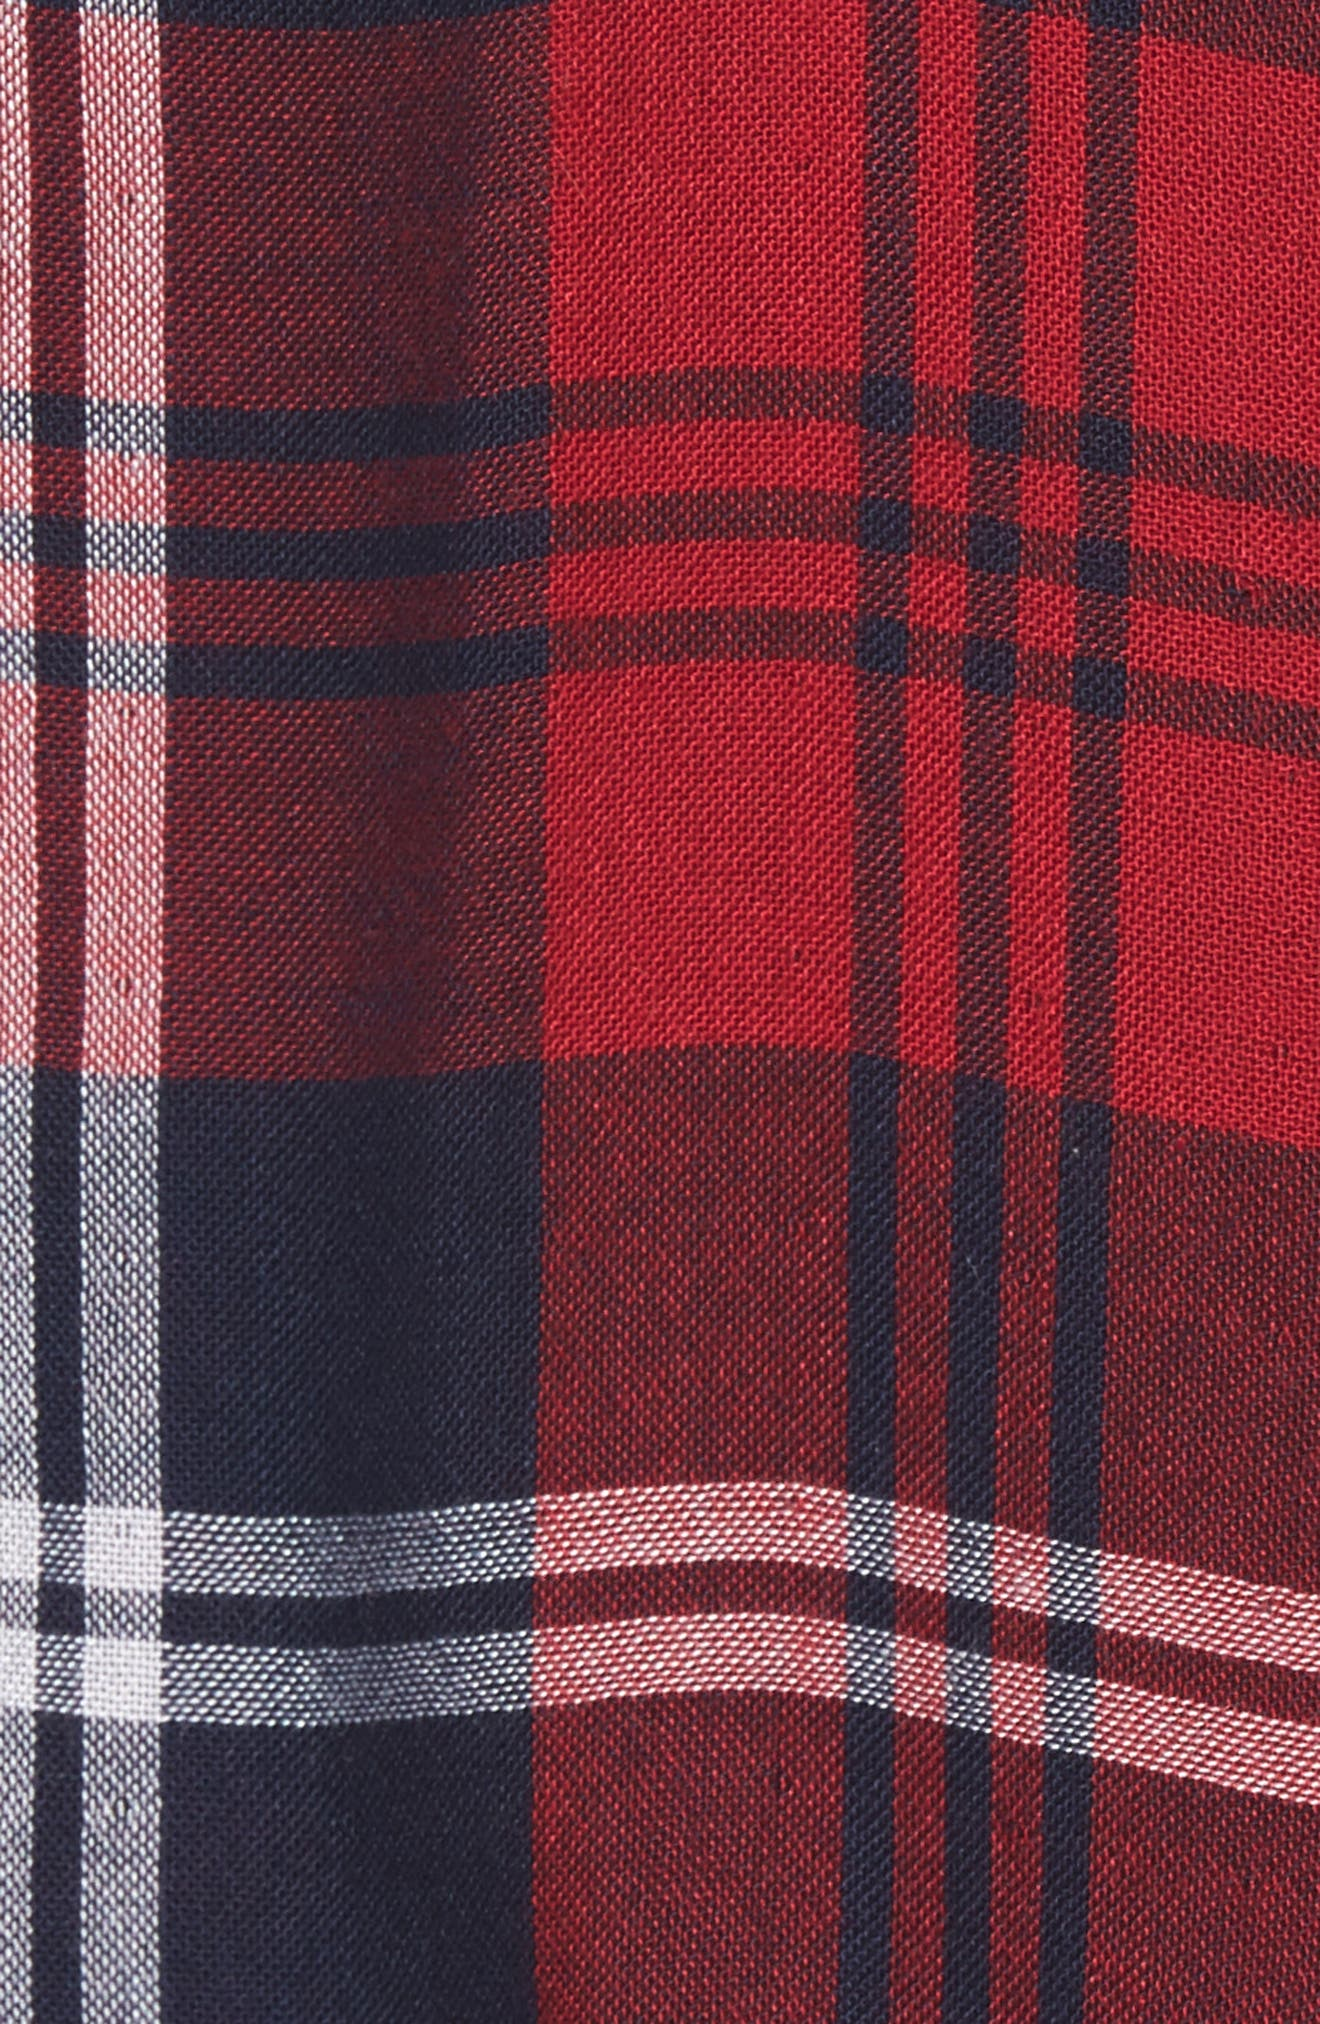 Taitum Plaid Shirt,                             Alternate thumbnail 5, color,                             622